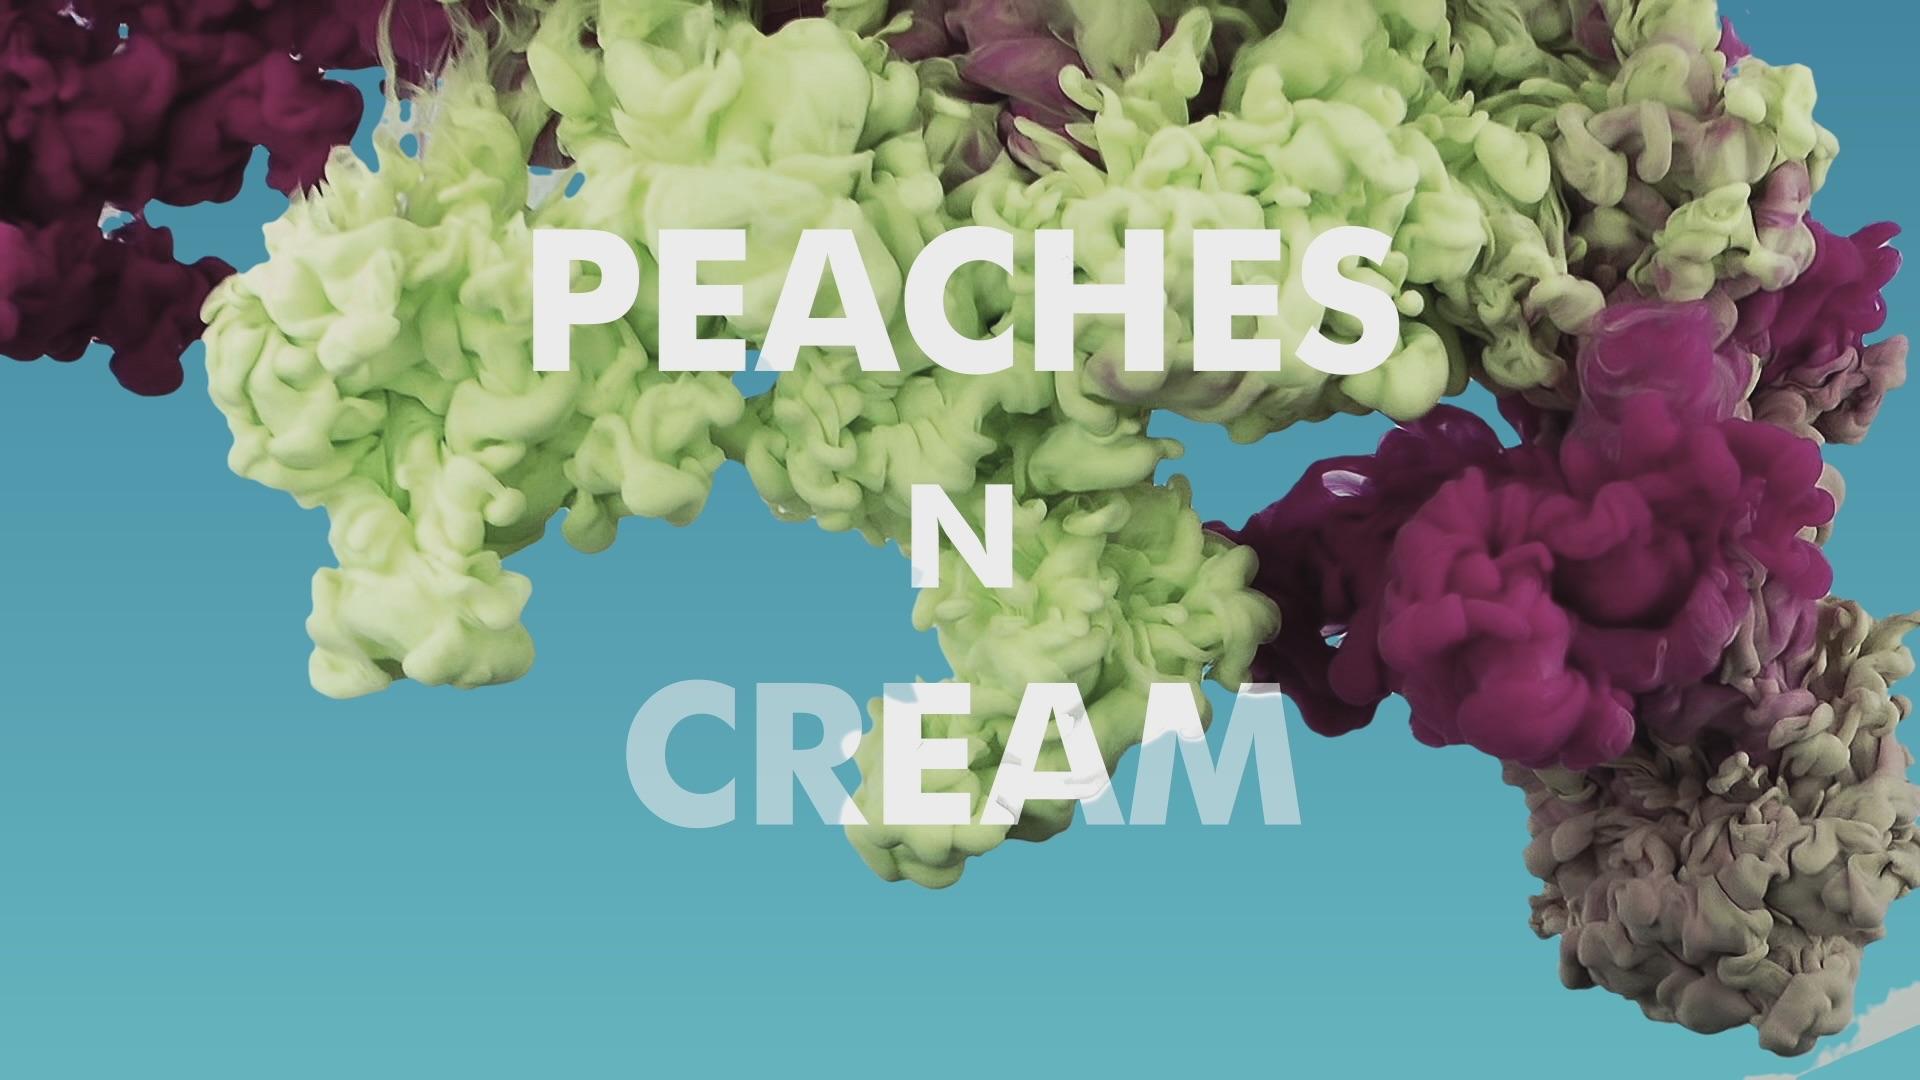 6bb64af7a70f Peaches N Cream (Lyric Video) by Snoop Dogg on Apple Music